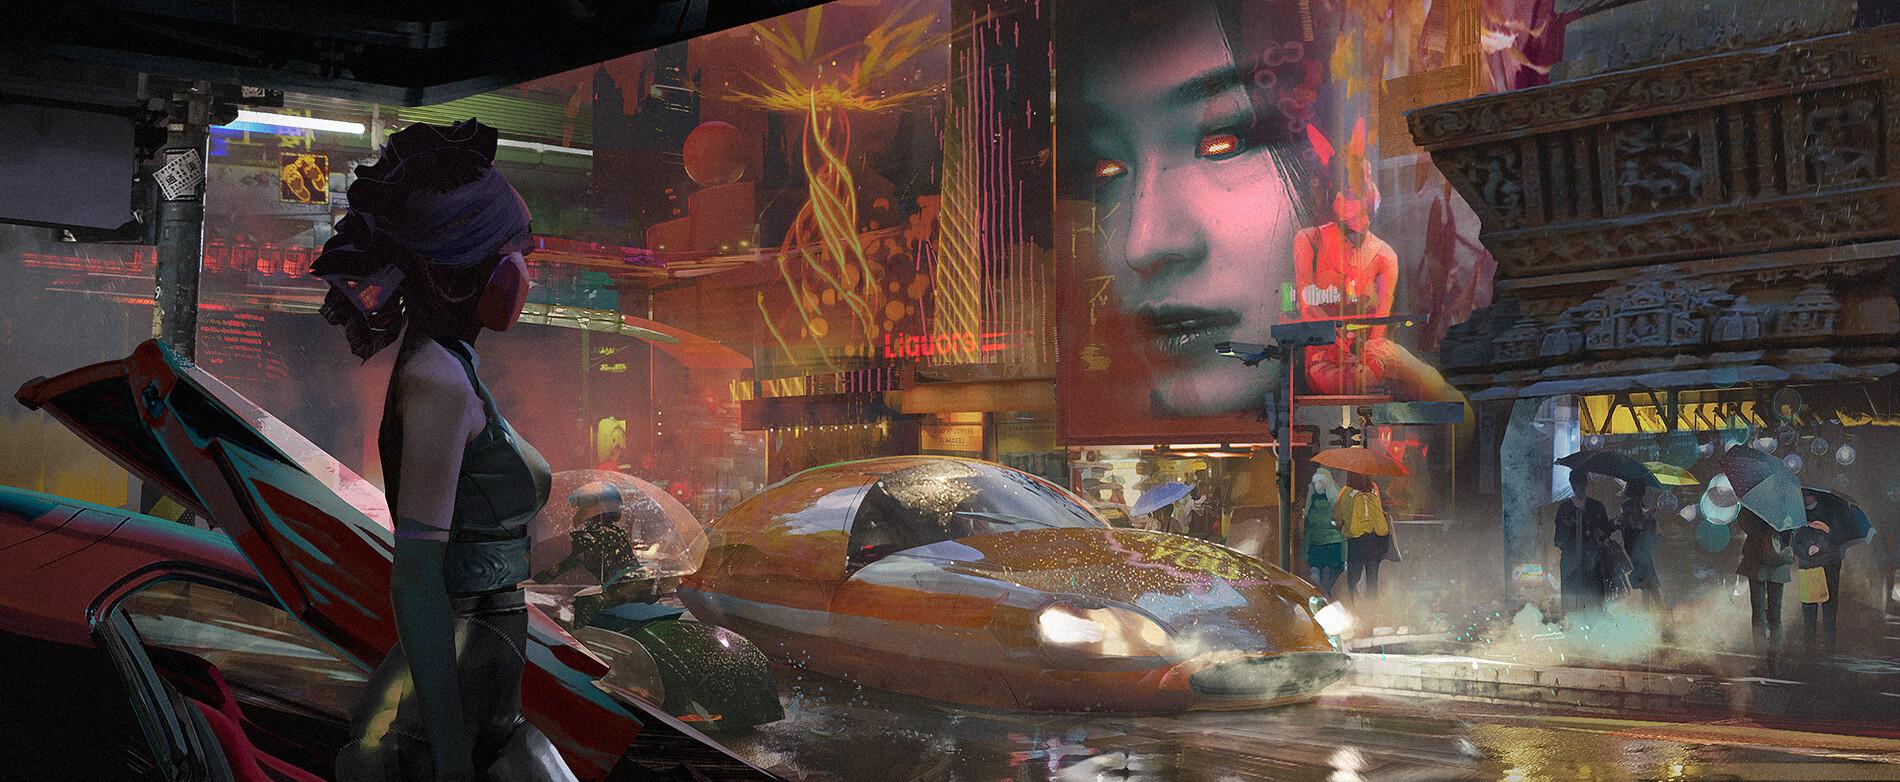 The Amazing Science Fiction Art of Daniel Romanovsky